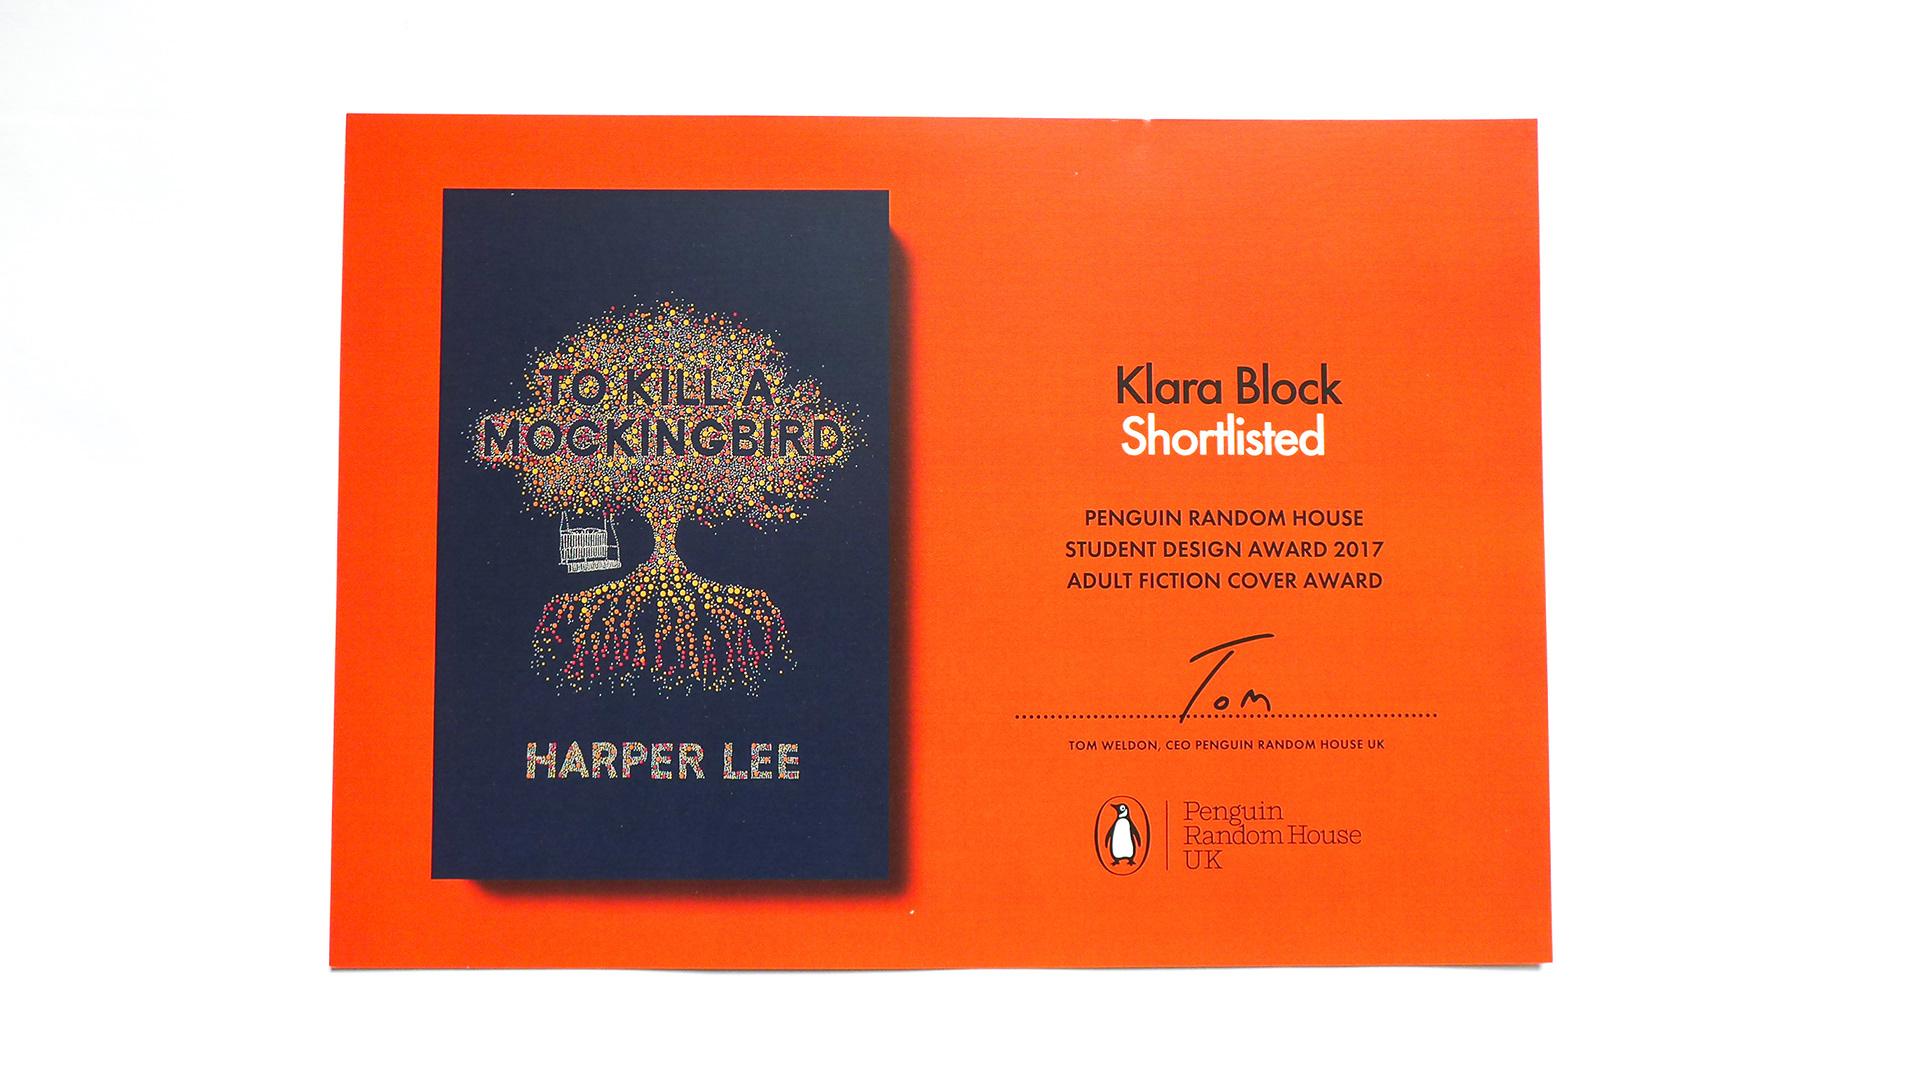 Penguin Book Cover Layout : Klara block penguin book cover design